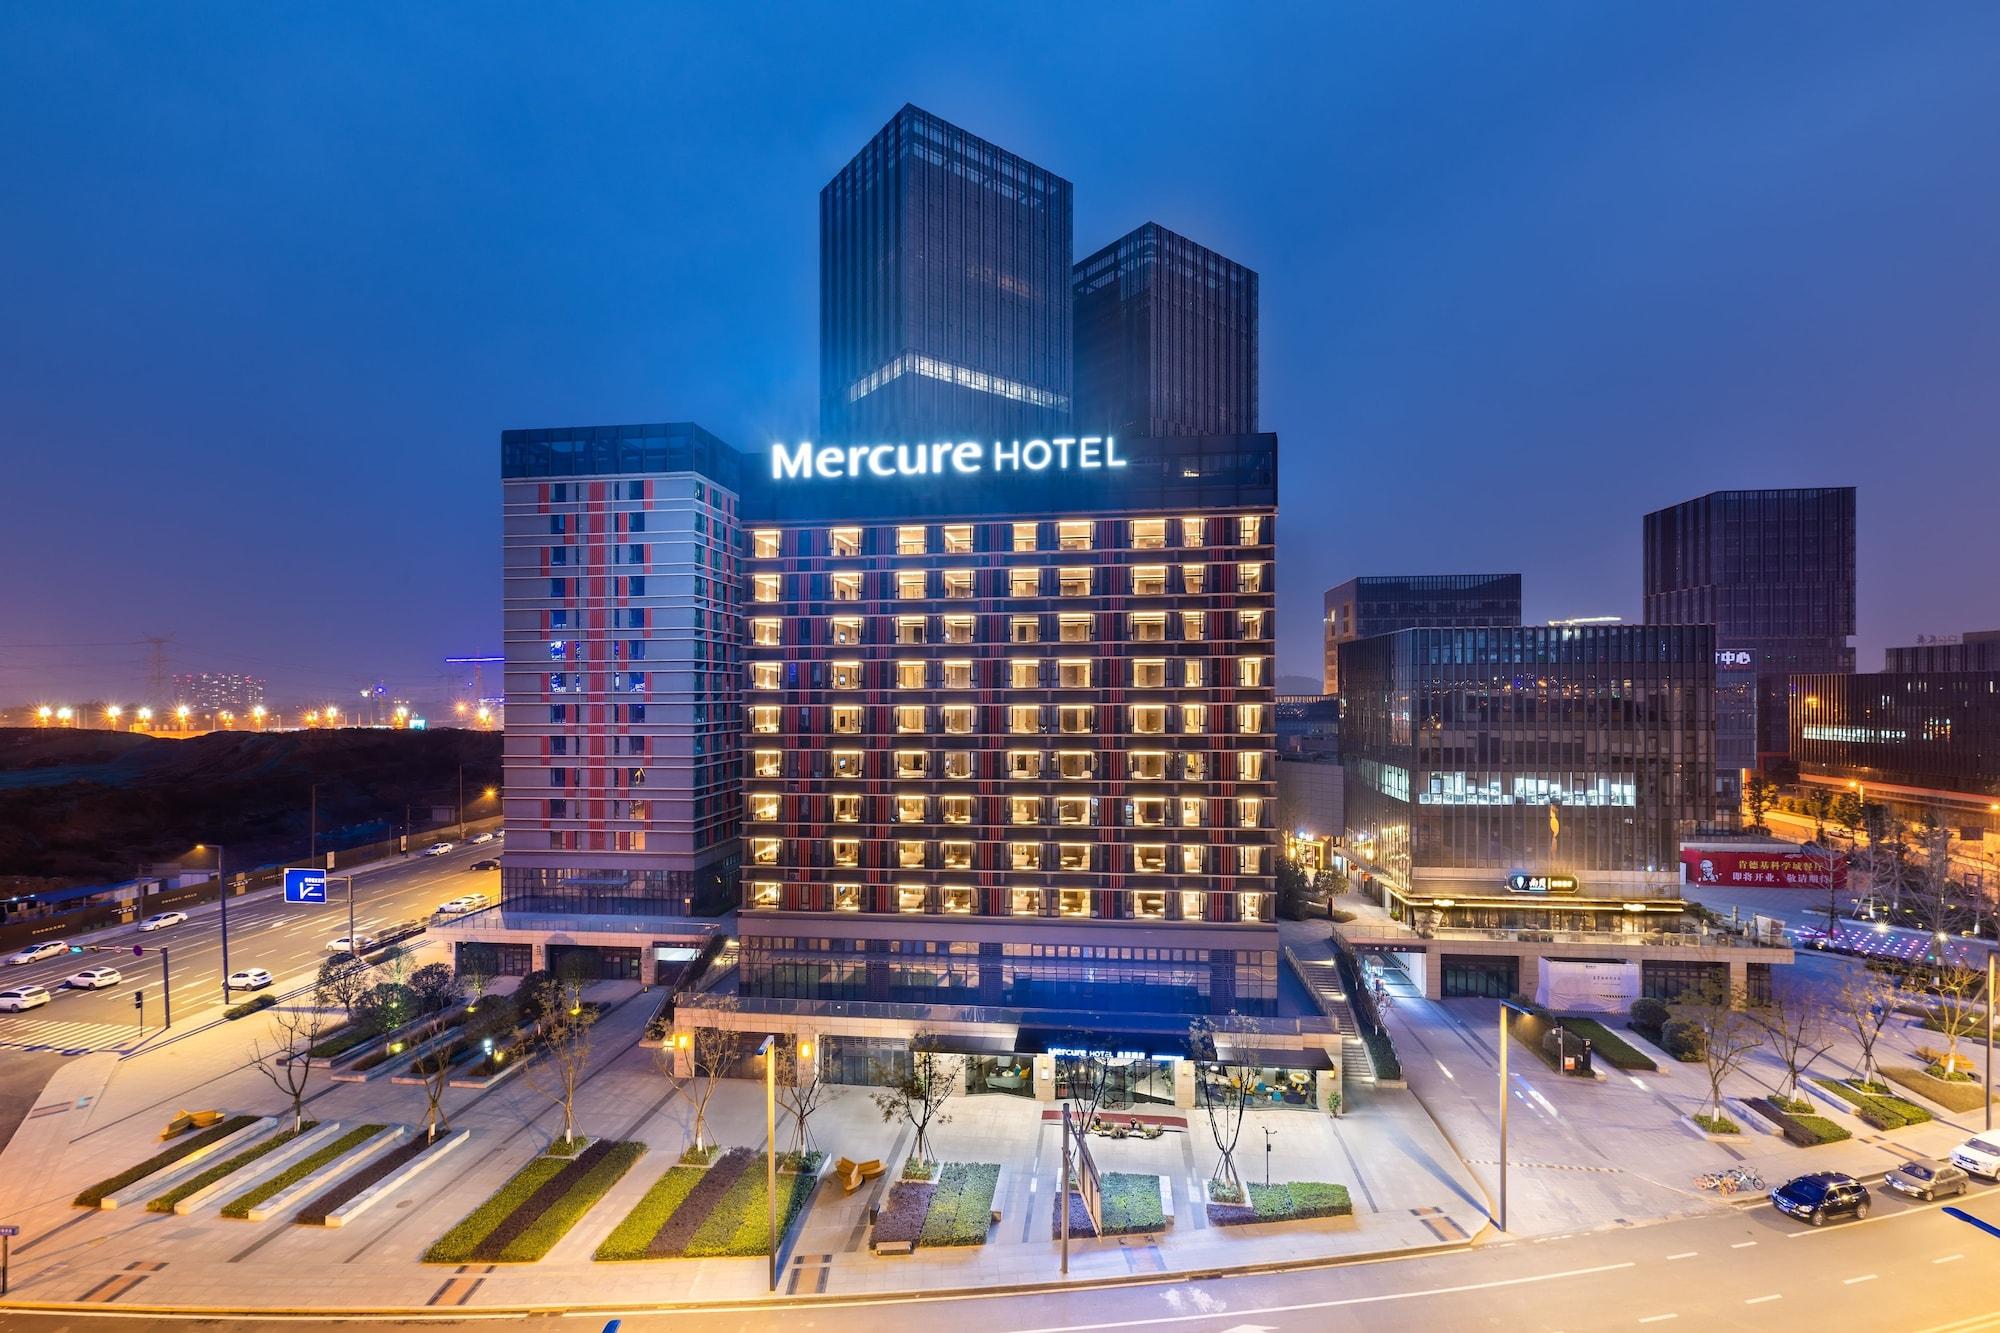 Mercure Chengdu Exhibition Center, Chengdu